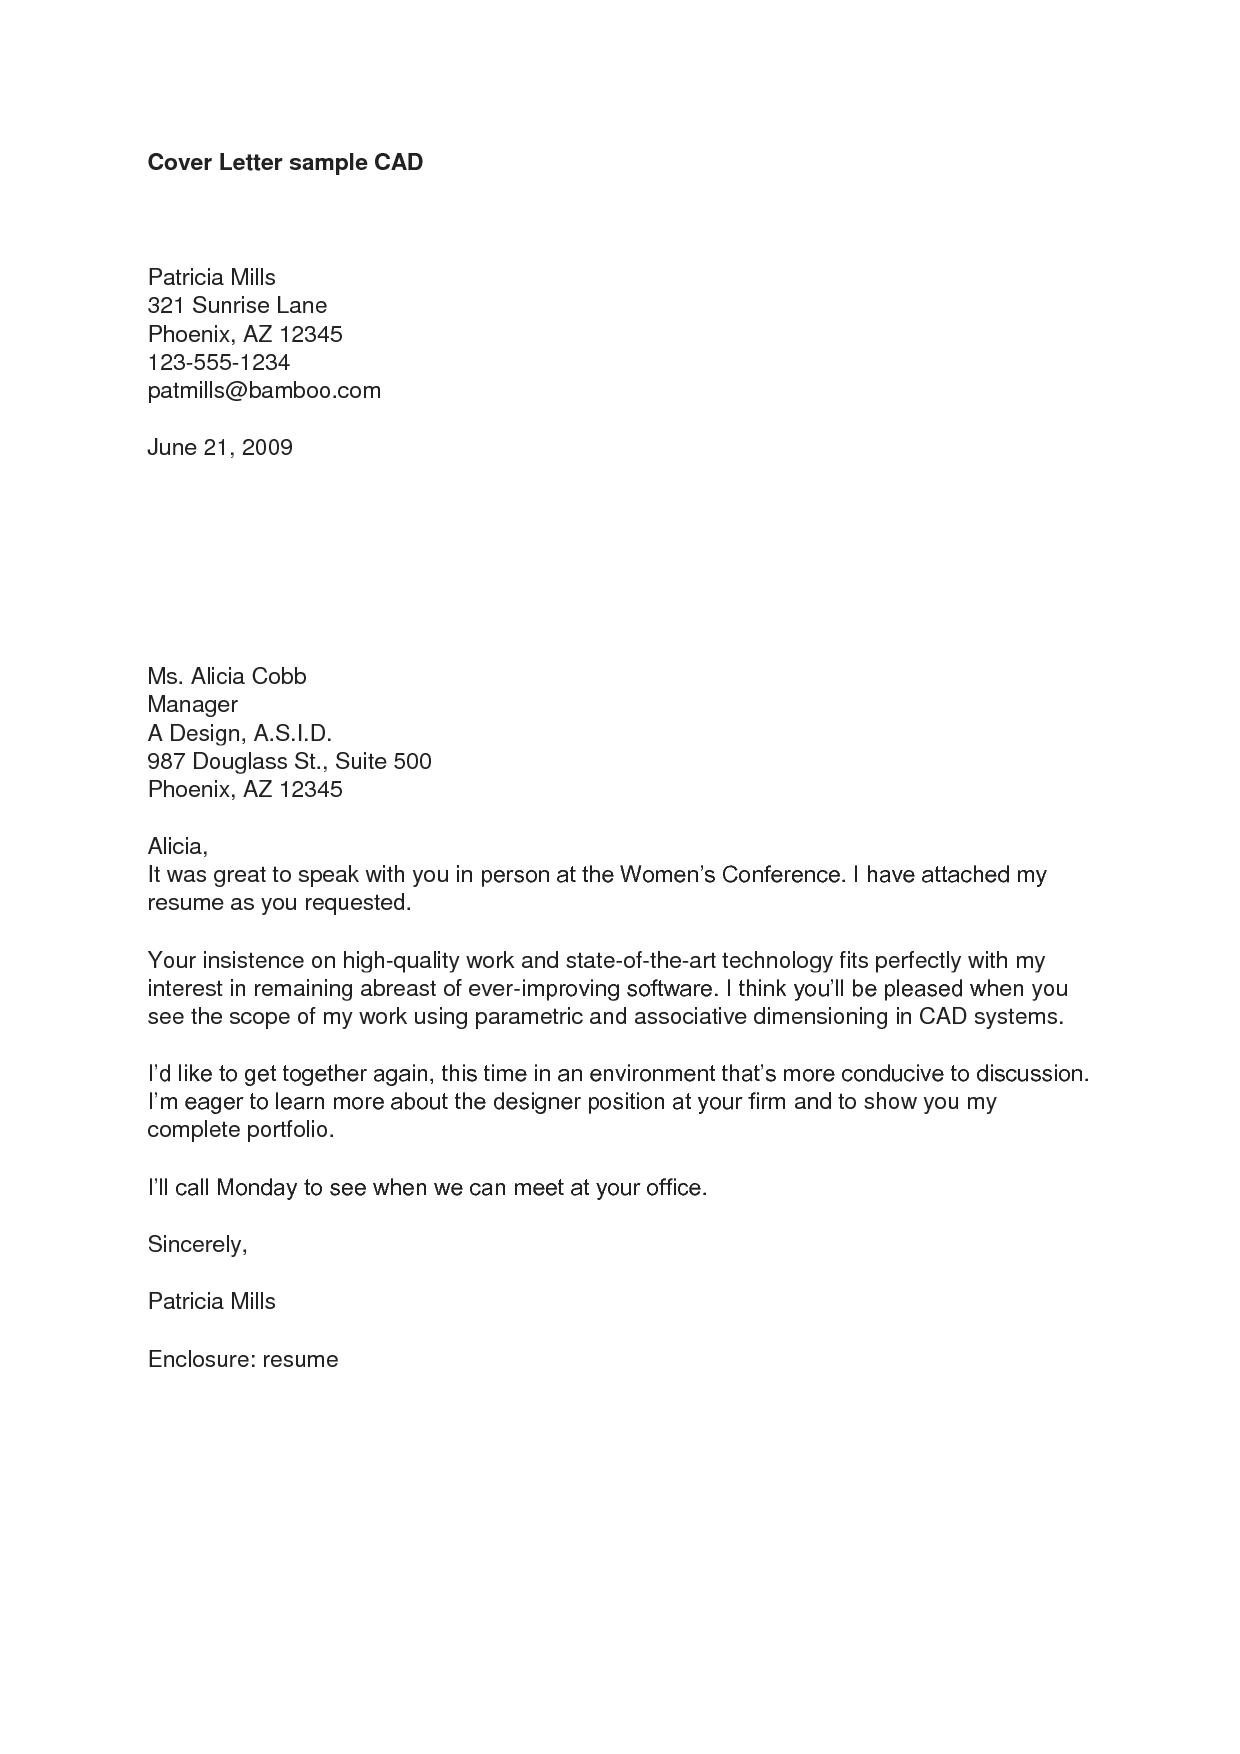 resume email sample format